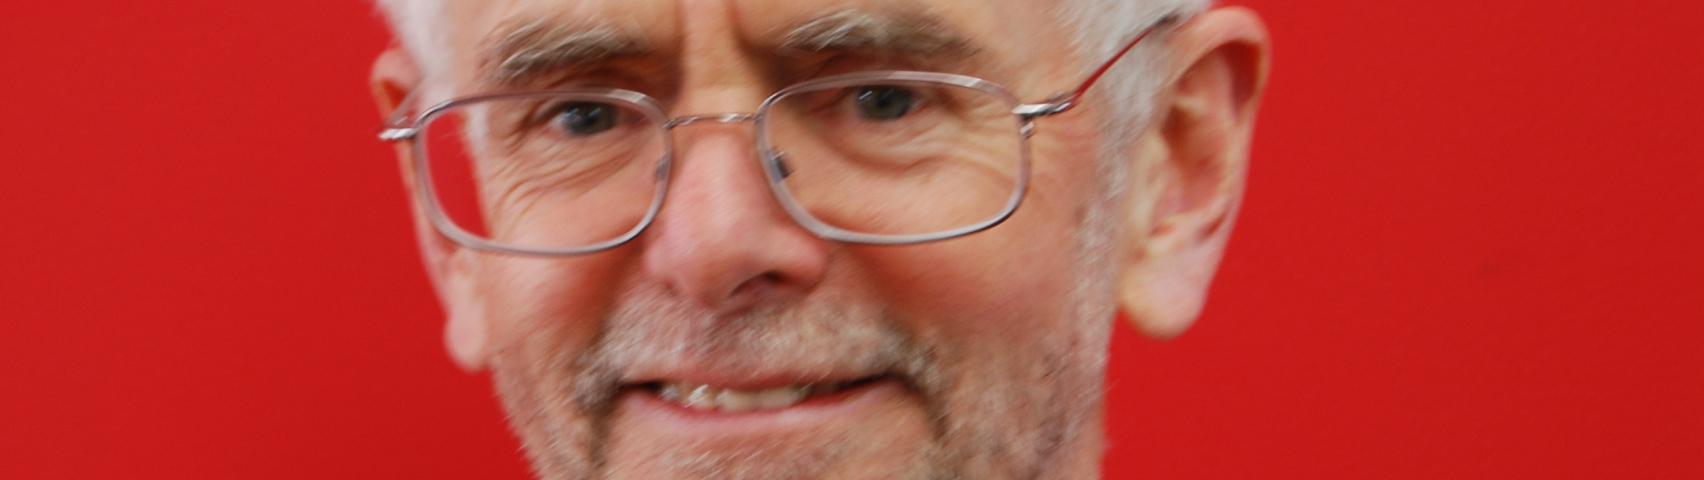 Professor Keith N. Frayn, University of Oxford